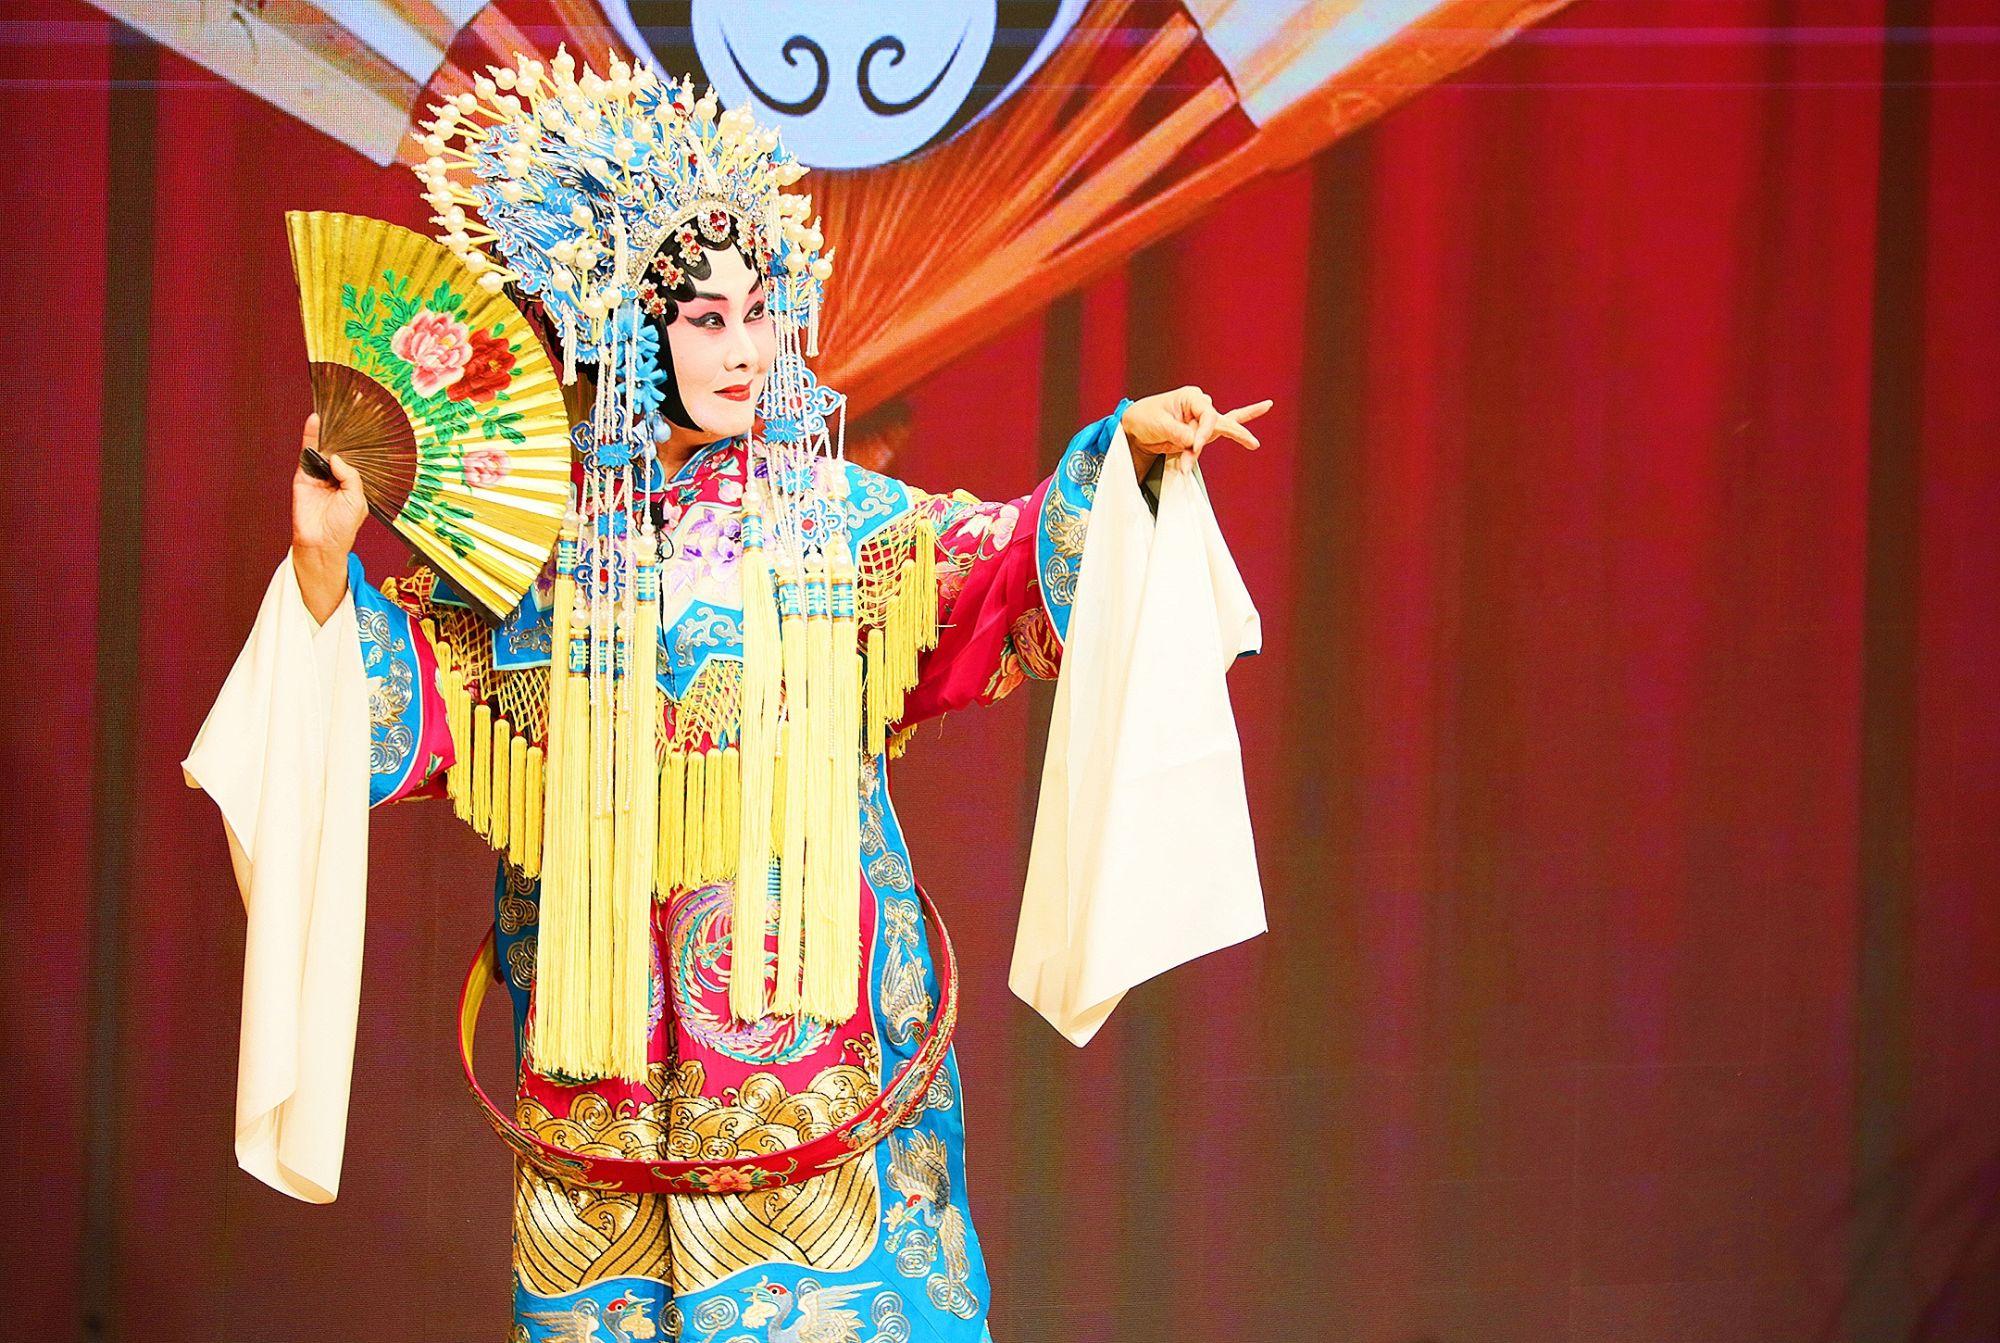 Beijing Opera Performances Enrich Our Campus Life